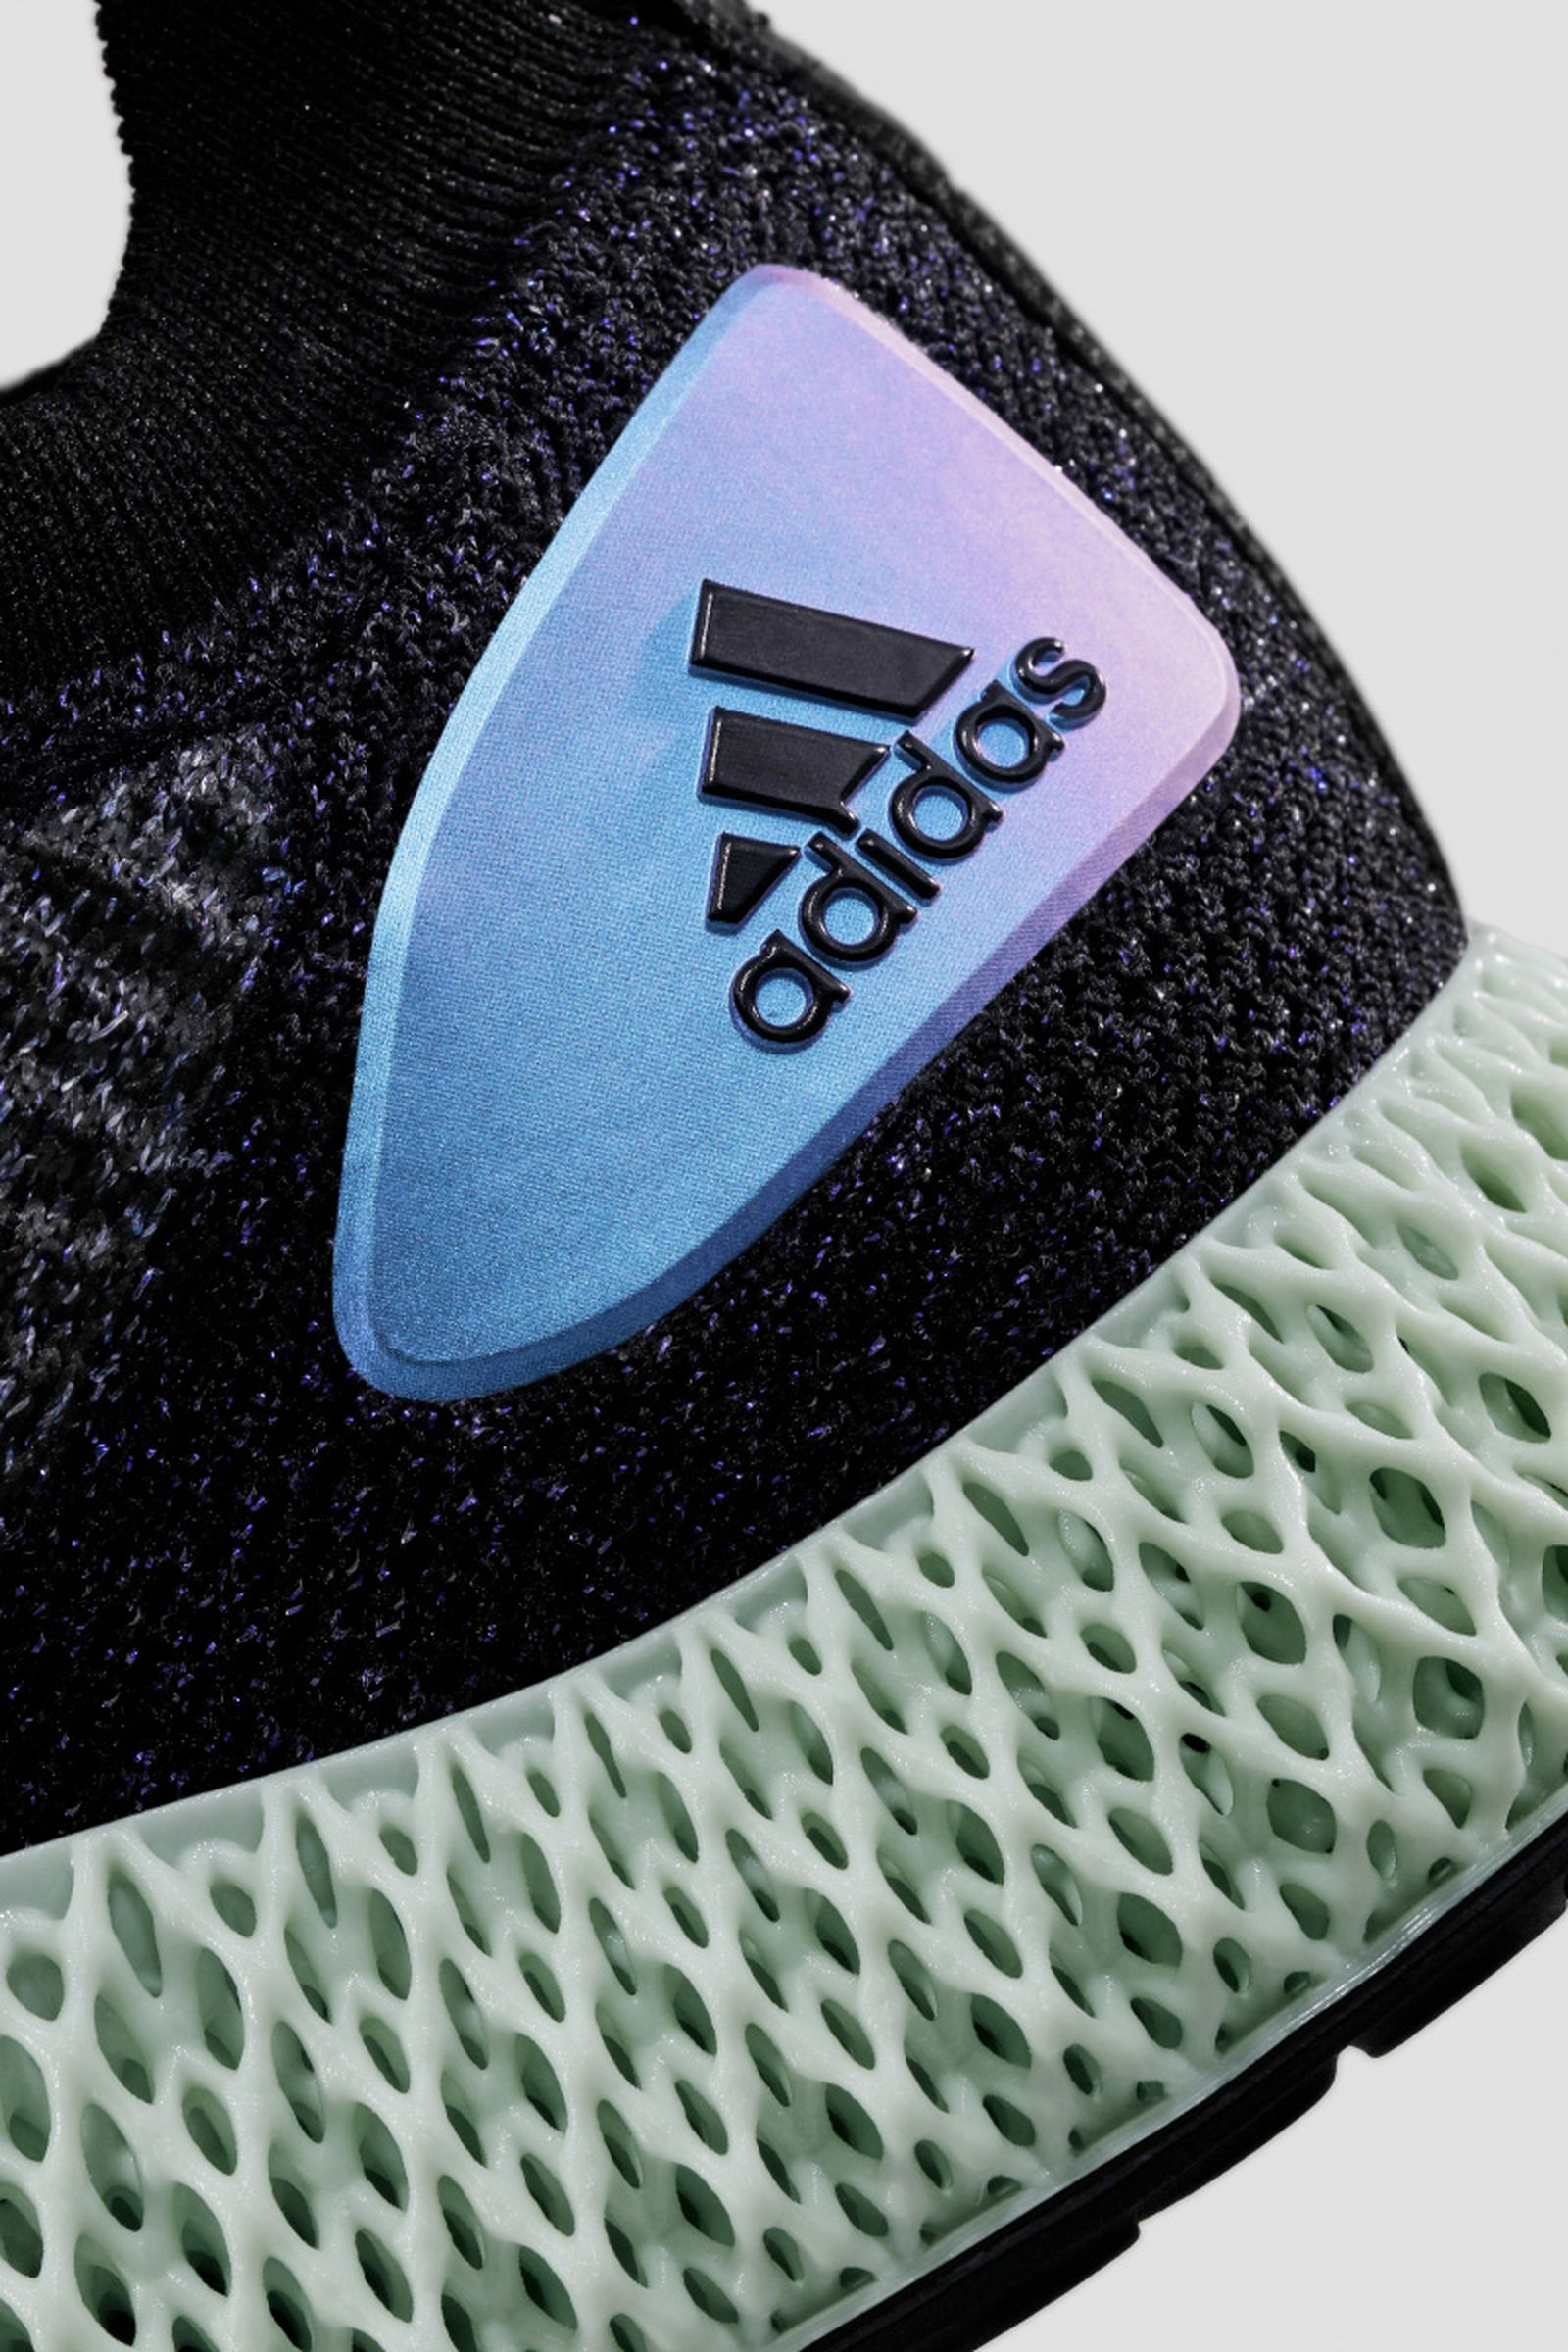 adidas-alphaedge-4d-goodbye-gravity-09